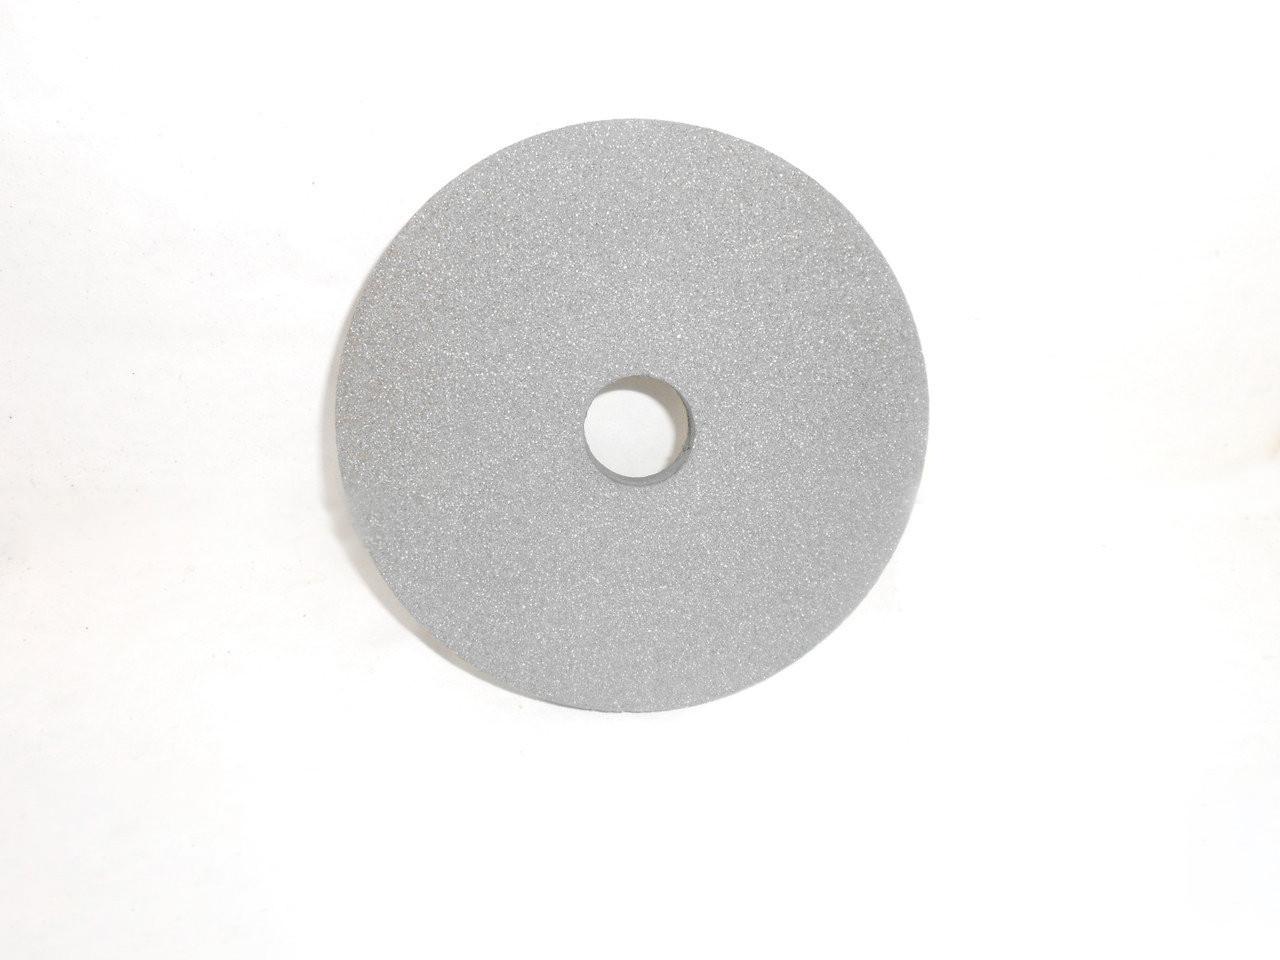 Круг шлифовальный 14А ПП 300х25х76  25-40 СМ